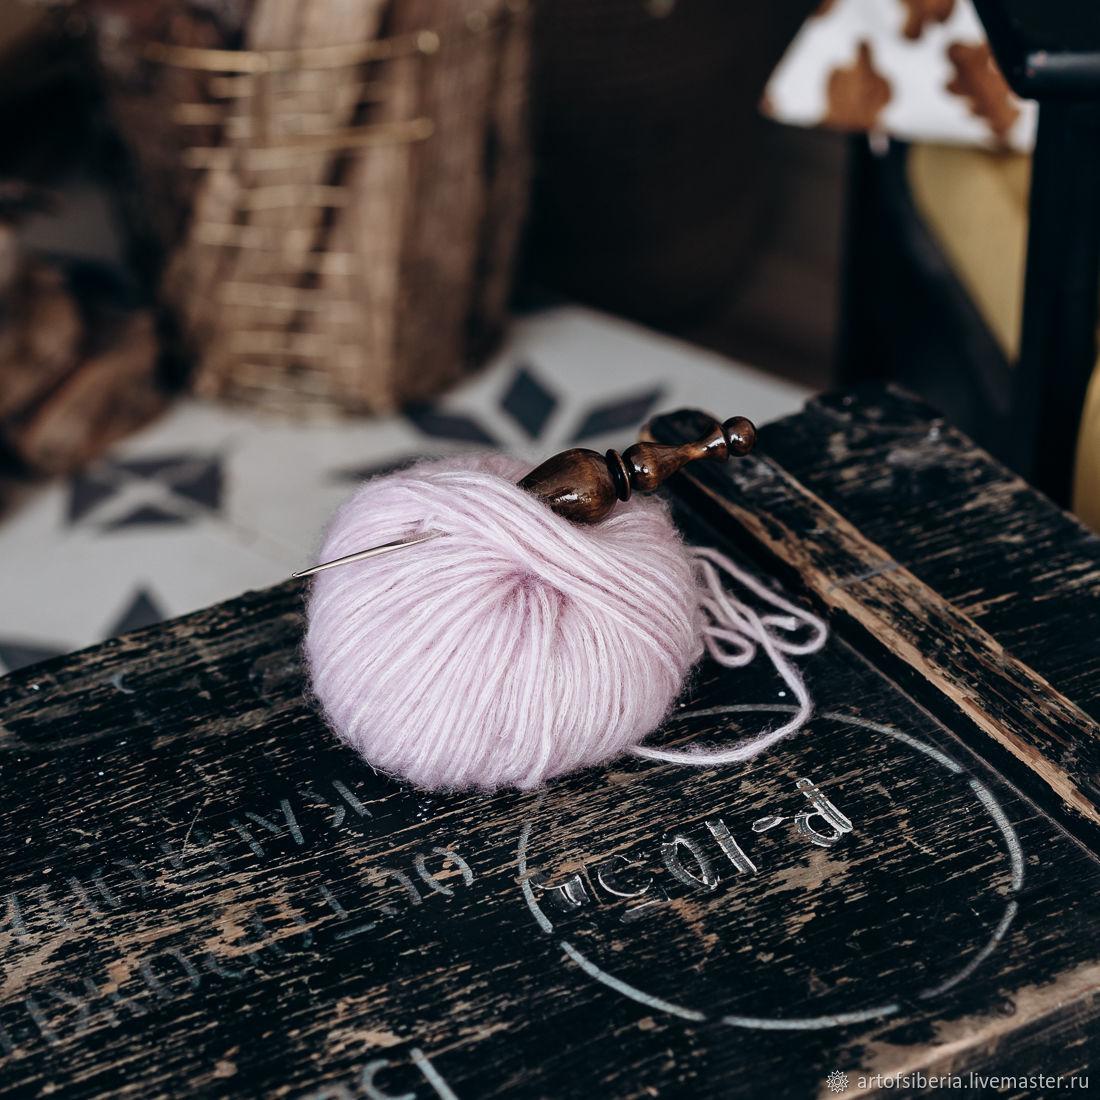 1,6 mm iron crochet hook with wooden handle (cedar) K220, Crochet Hooks, Novokuznetsk,  Фото №1